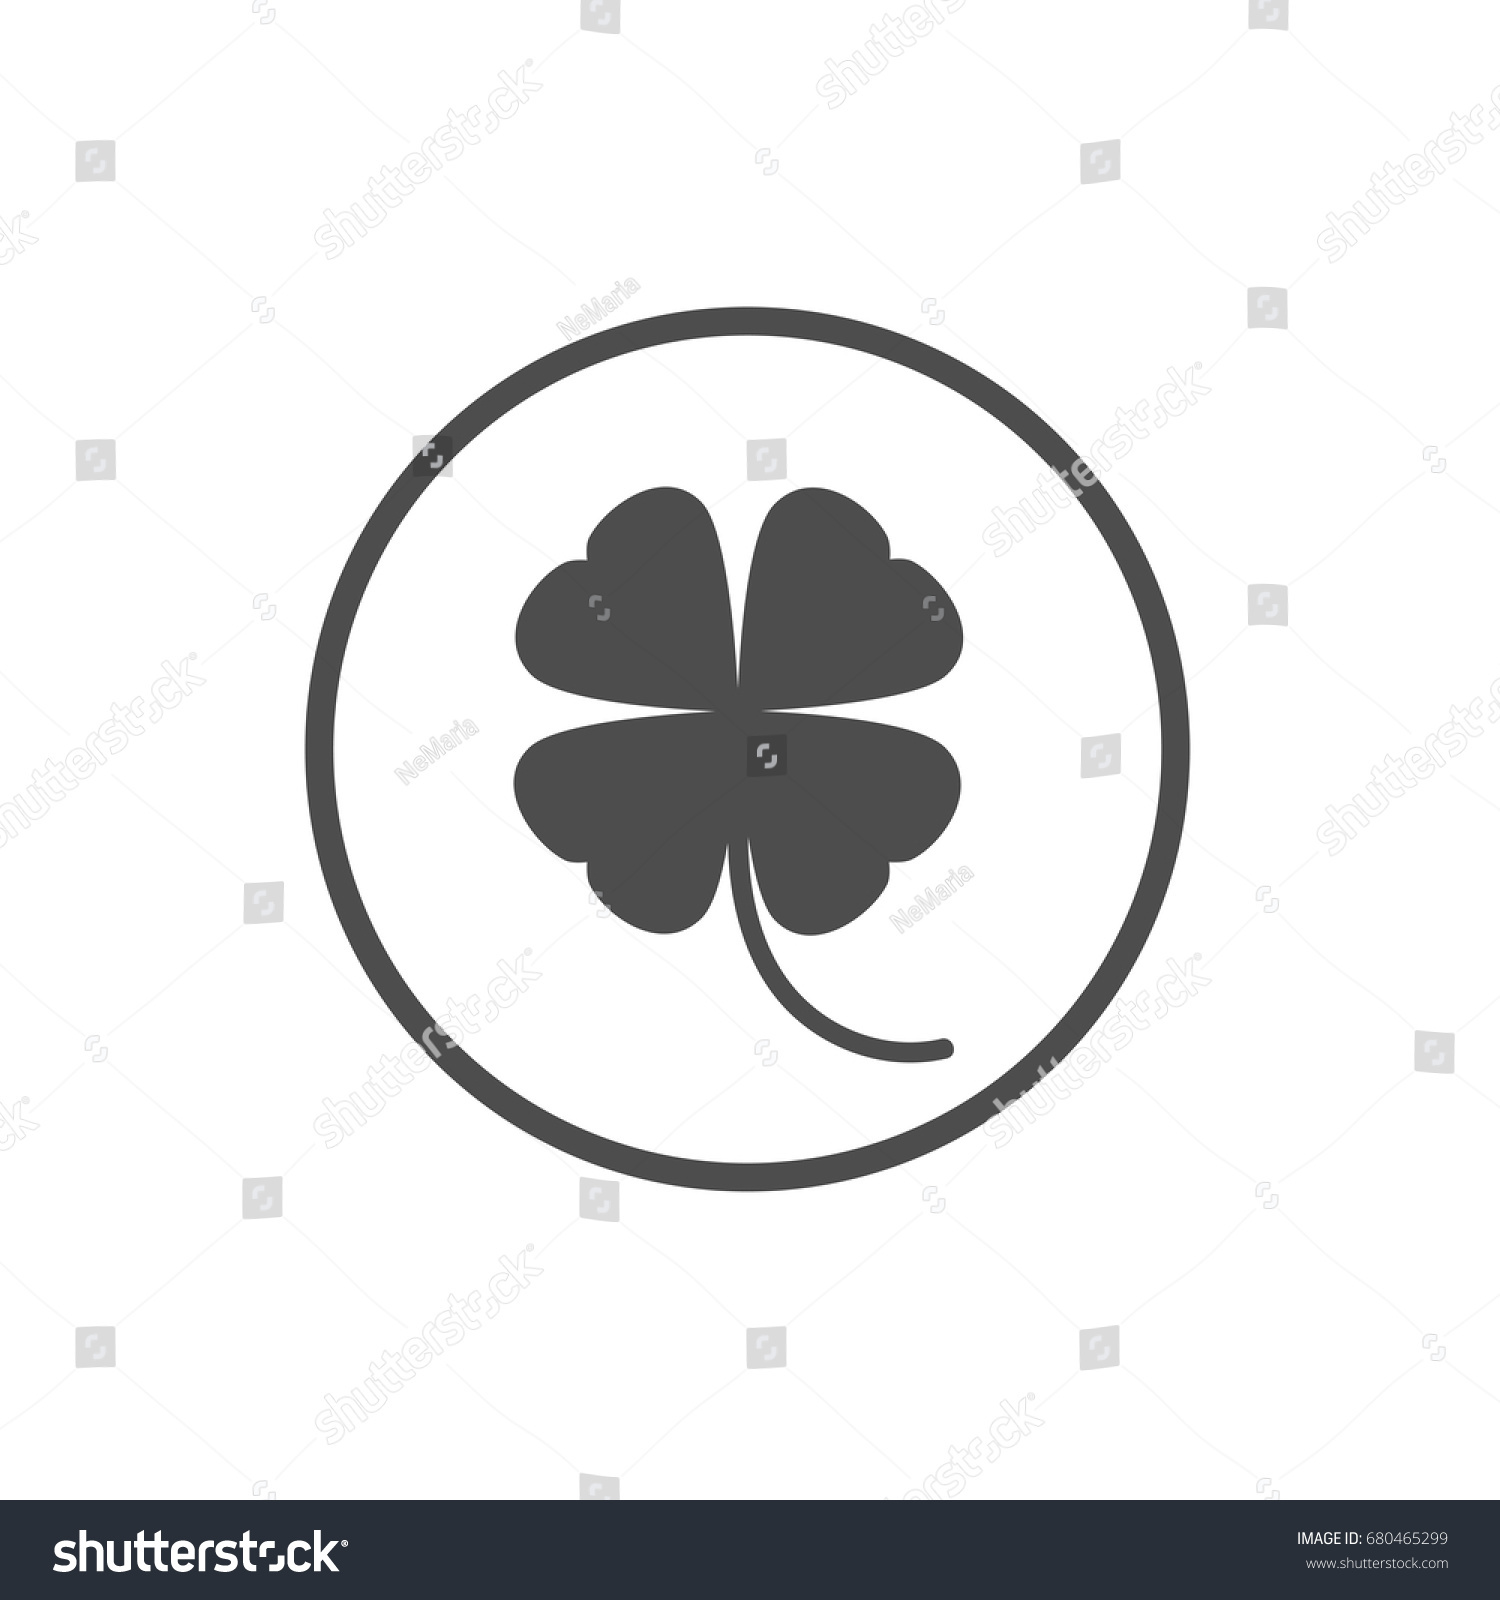 black flat icon irish clover circle stock vector 680465299